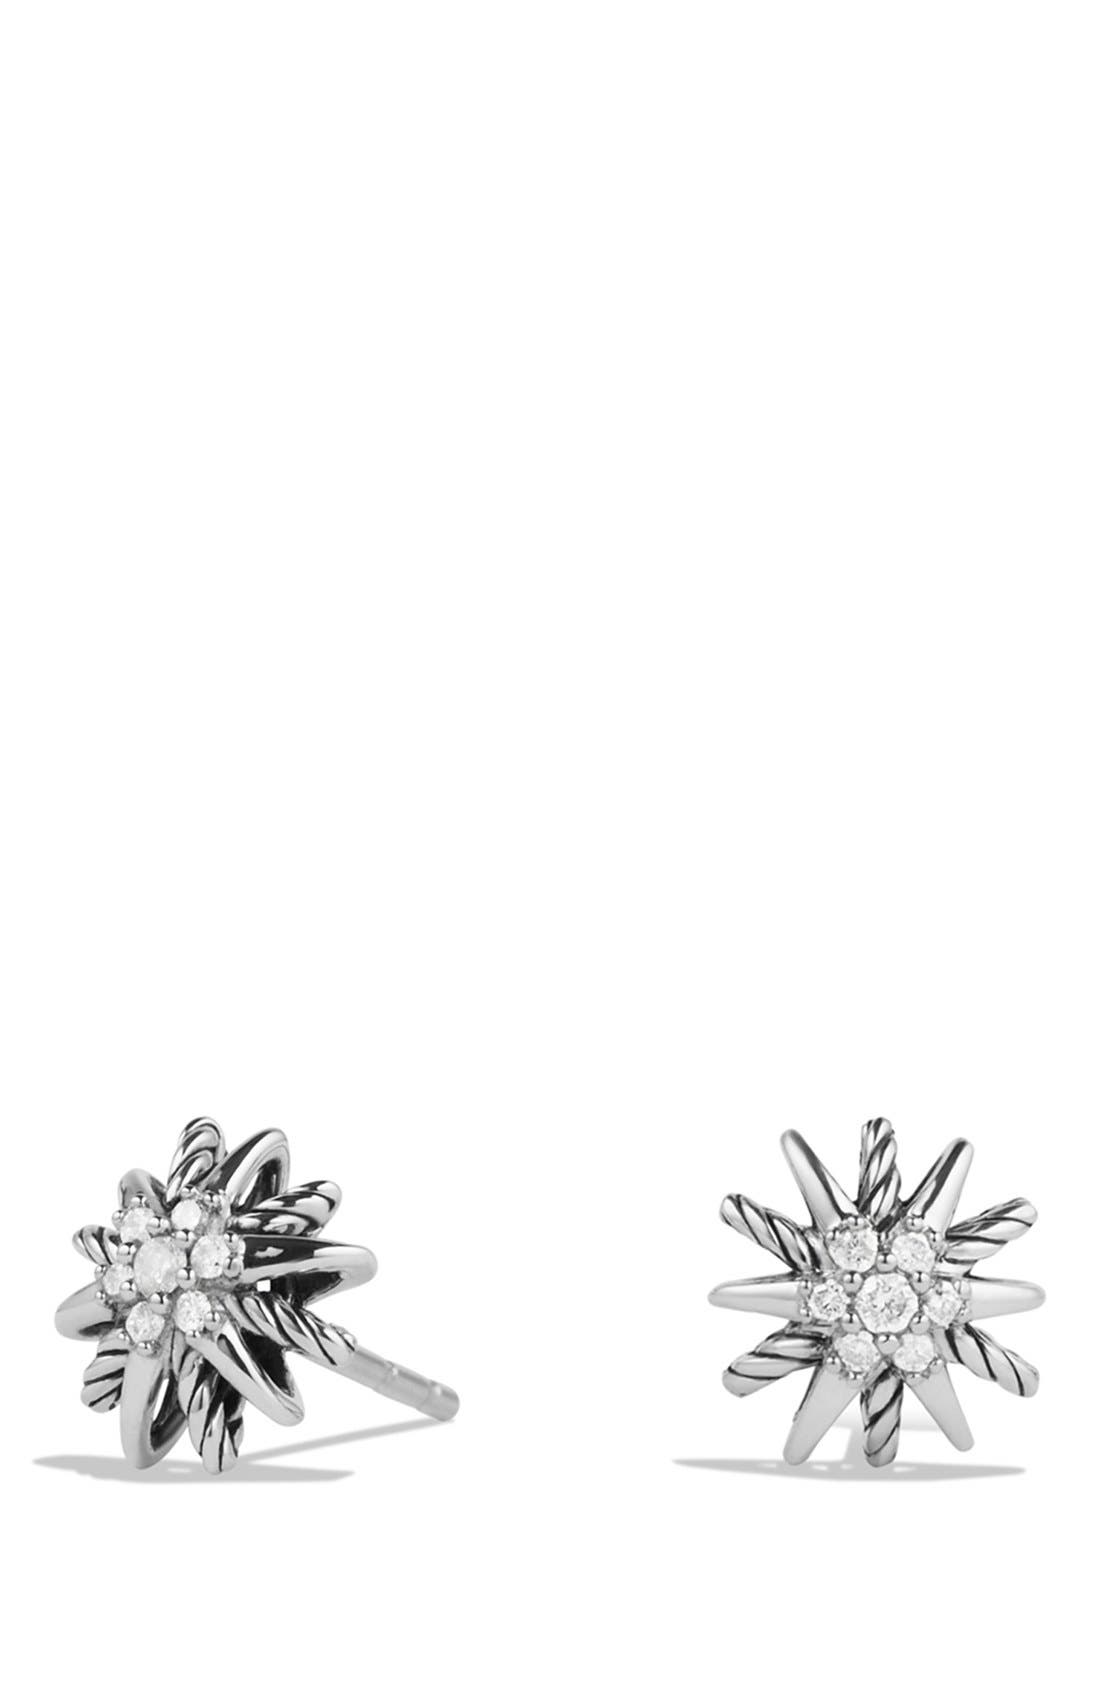 Main Image - David Yurman 'Starburst' Earrings with Diamonds